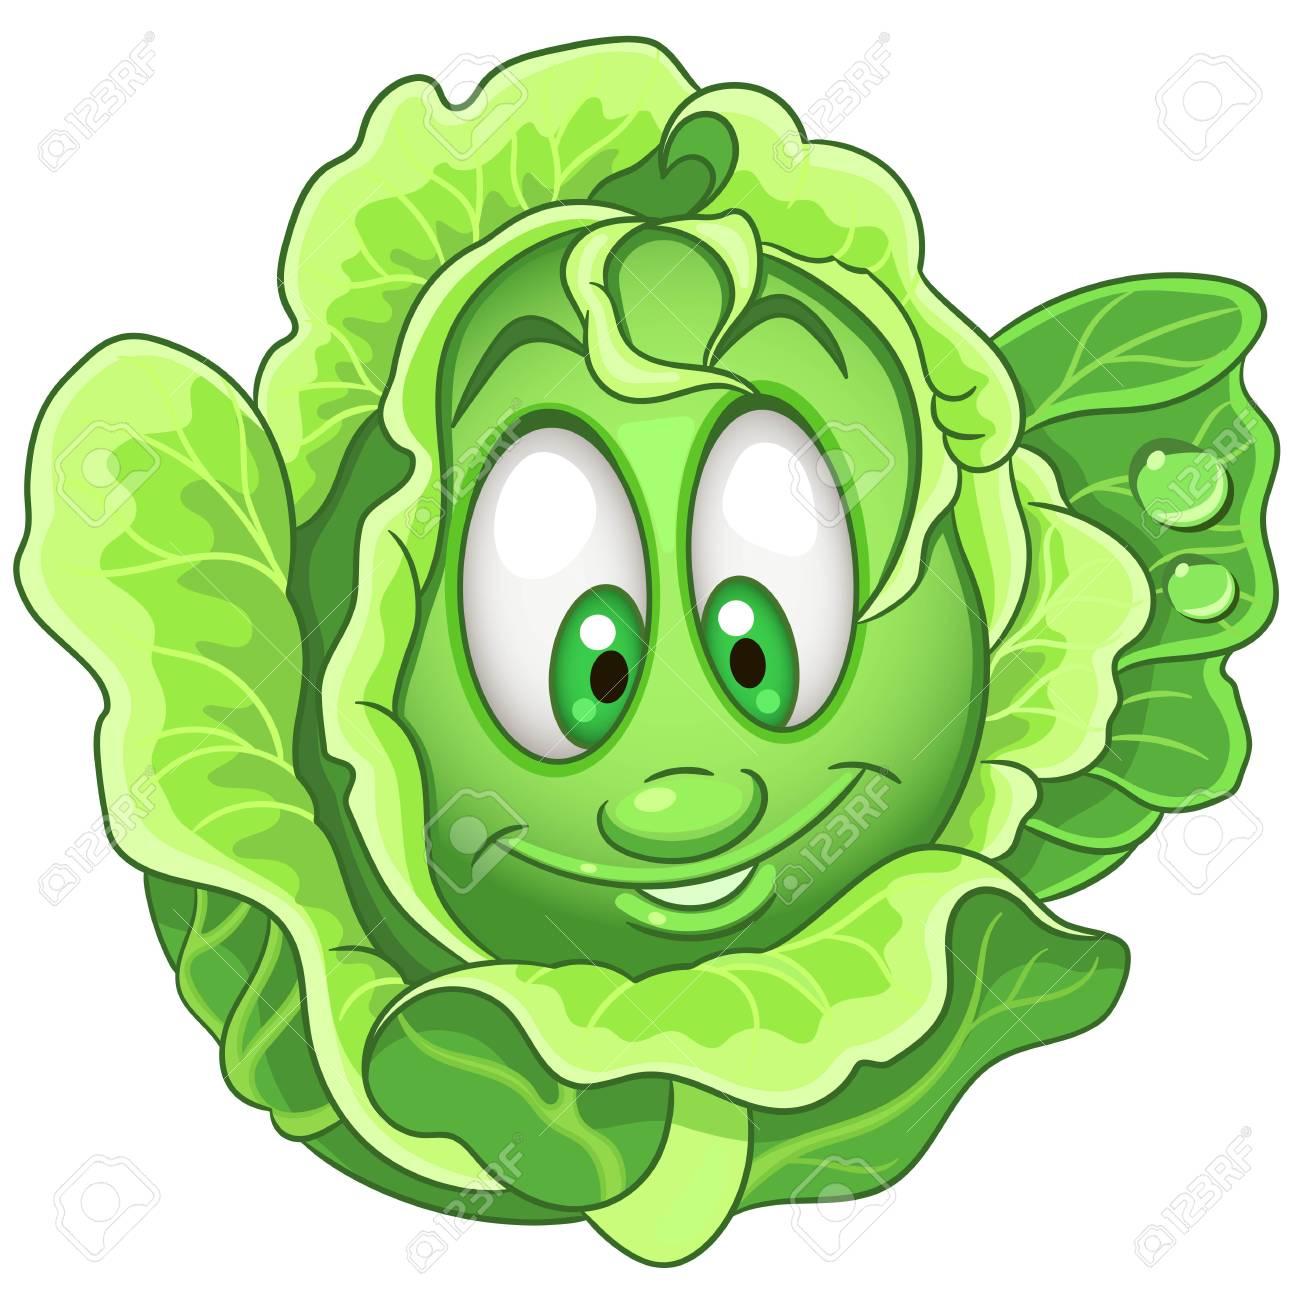 Cartoon Cabbage character. Iceberg Lettuce. Happy Vegetable symbol.